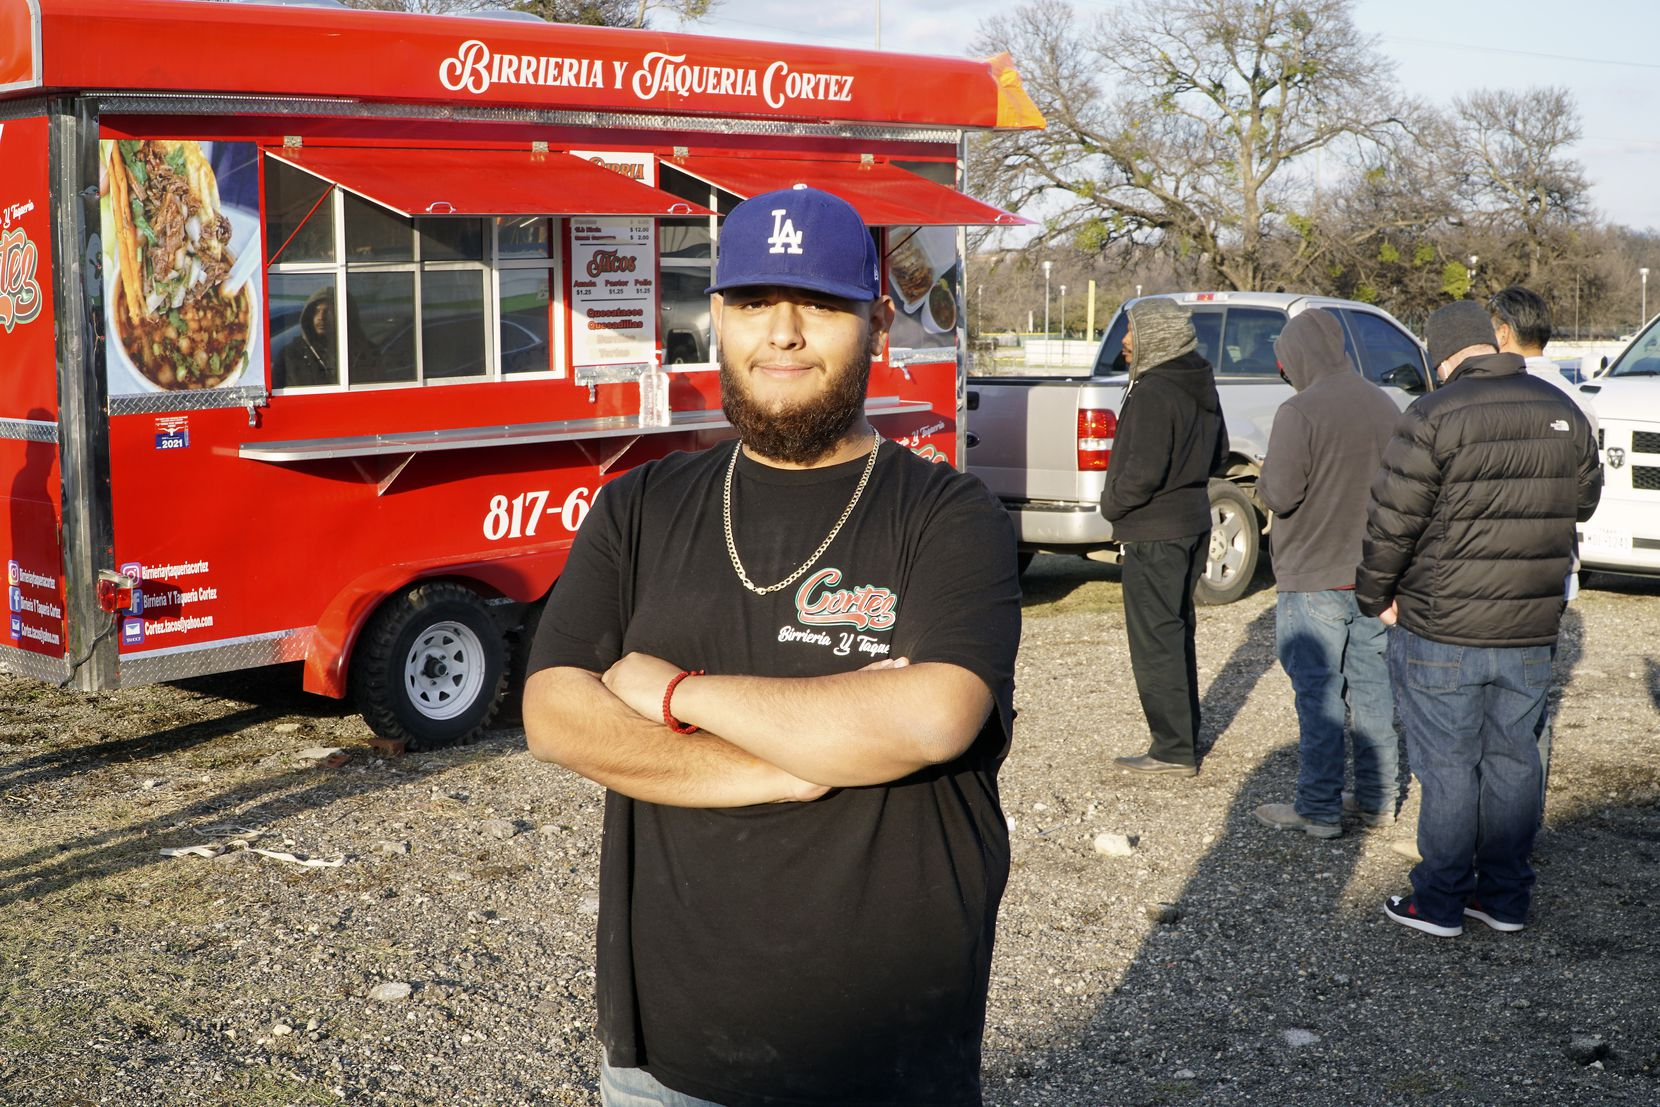 Rogelio Cortez Jr., owner of Birrieria Y Taqueria Cortez food truck in Fort Worth